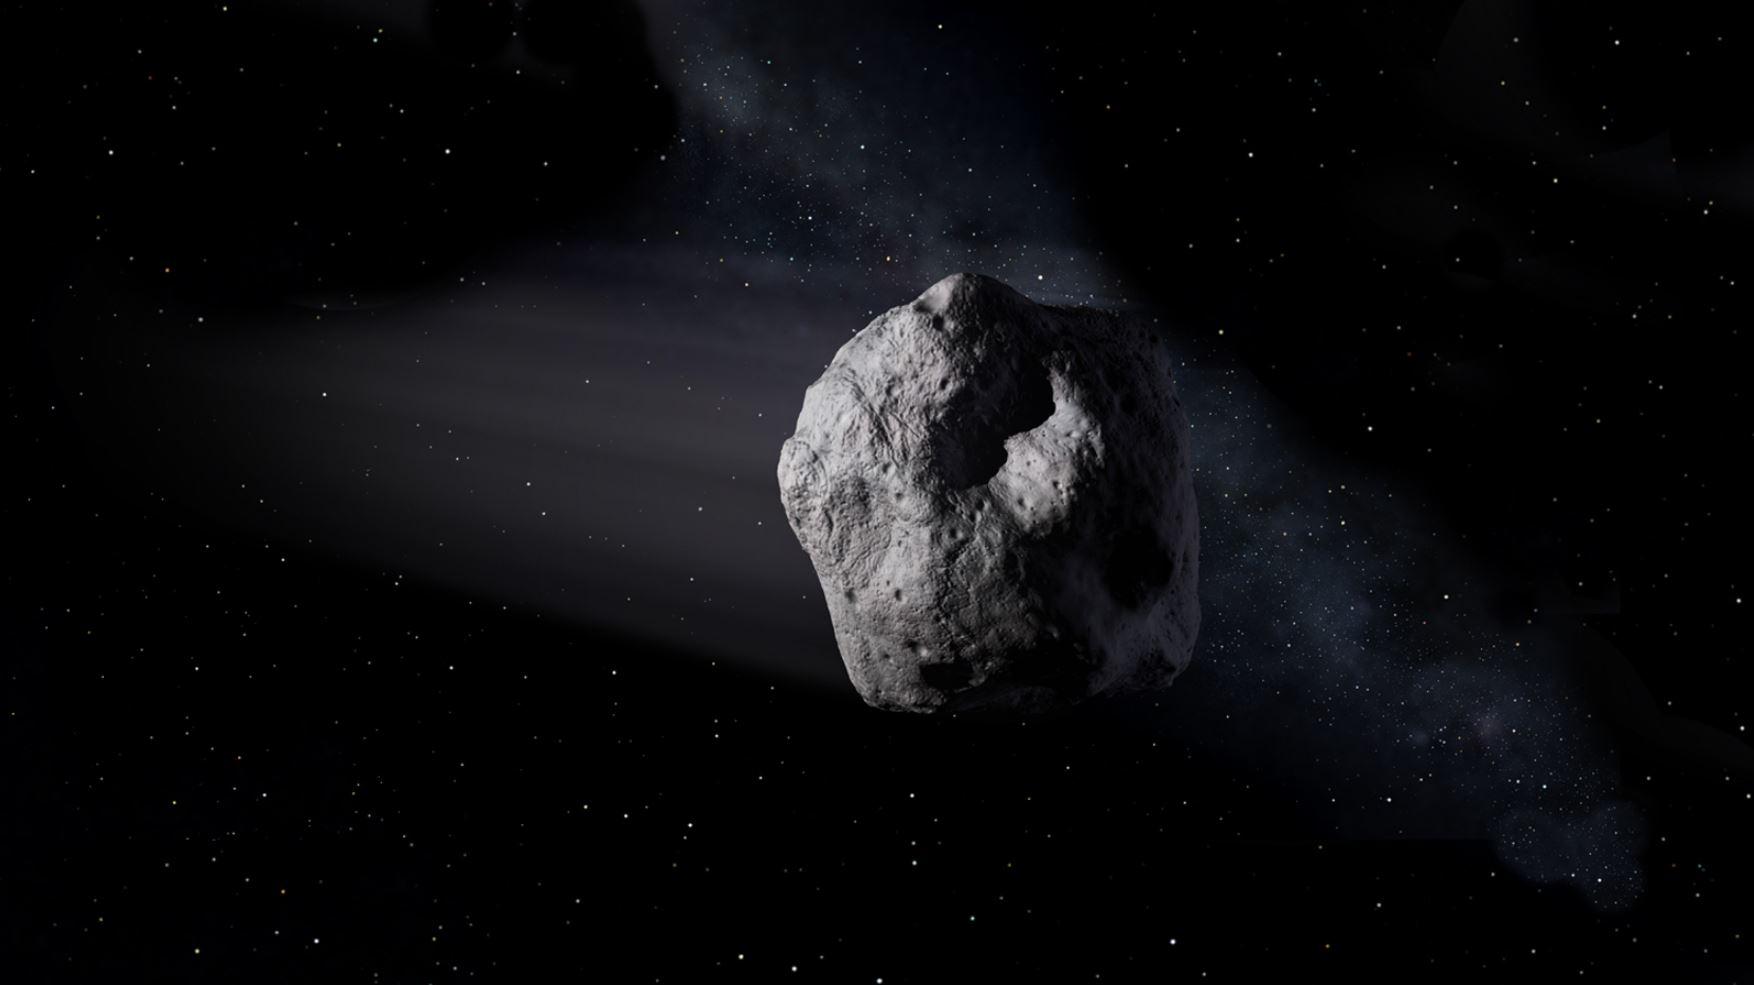 Image Credits:  NASA/JPL-Caltech via jpl.nasa.gov